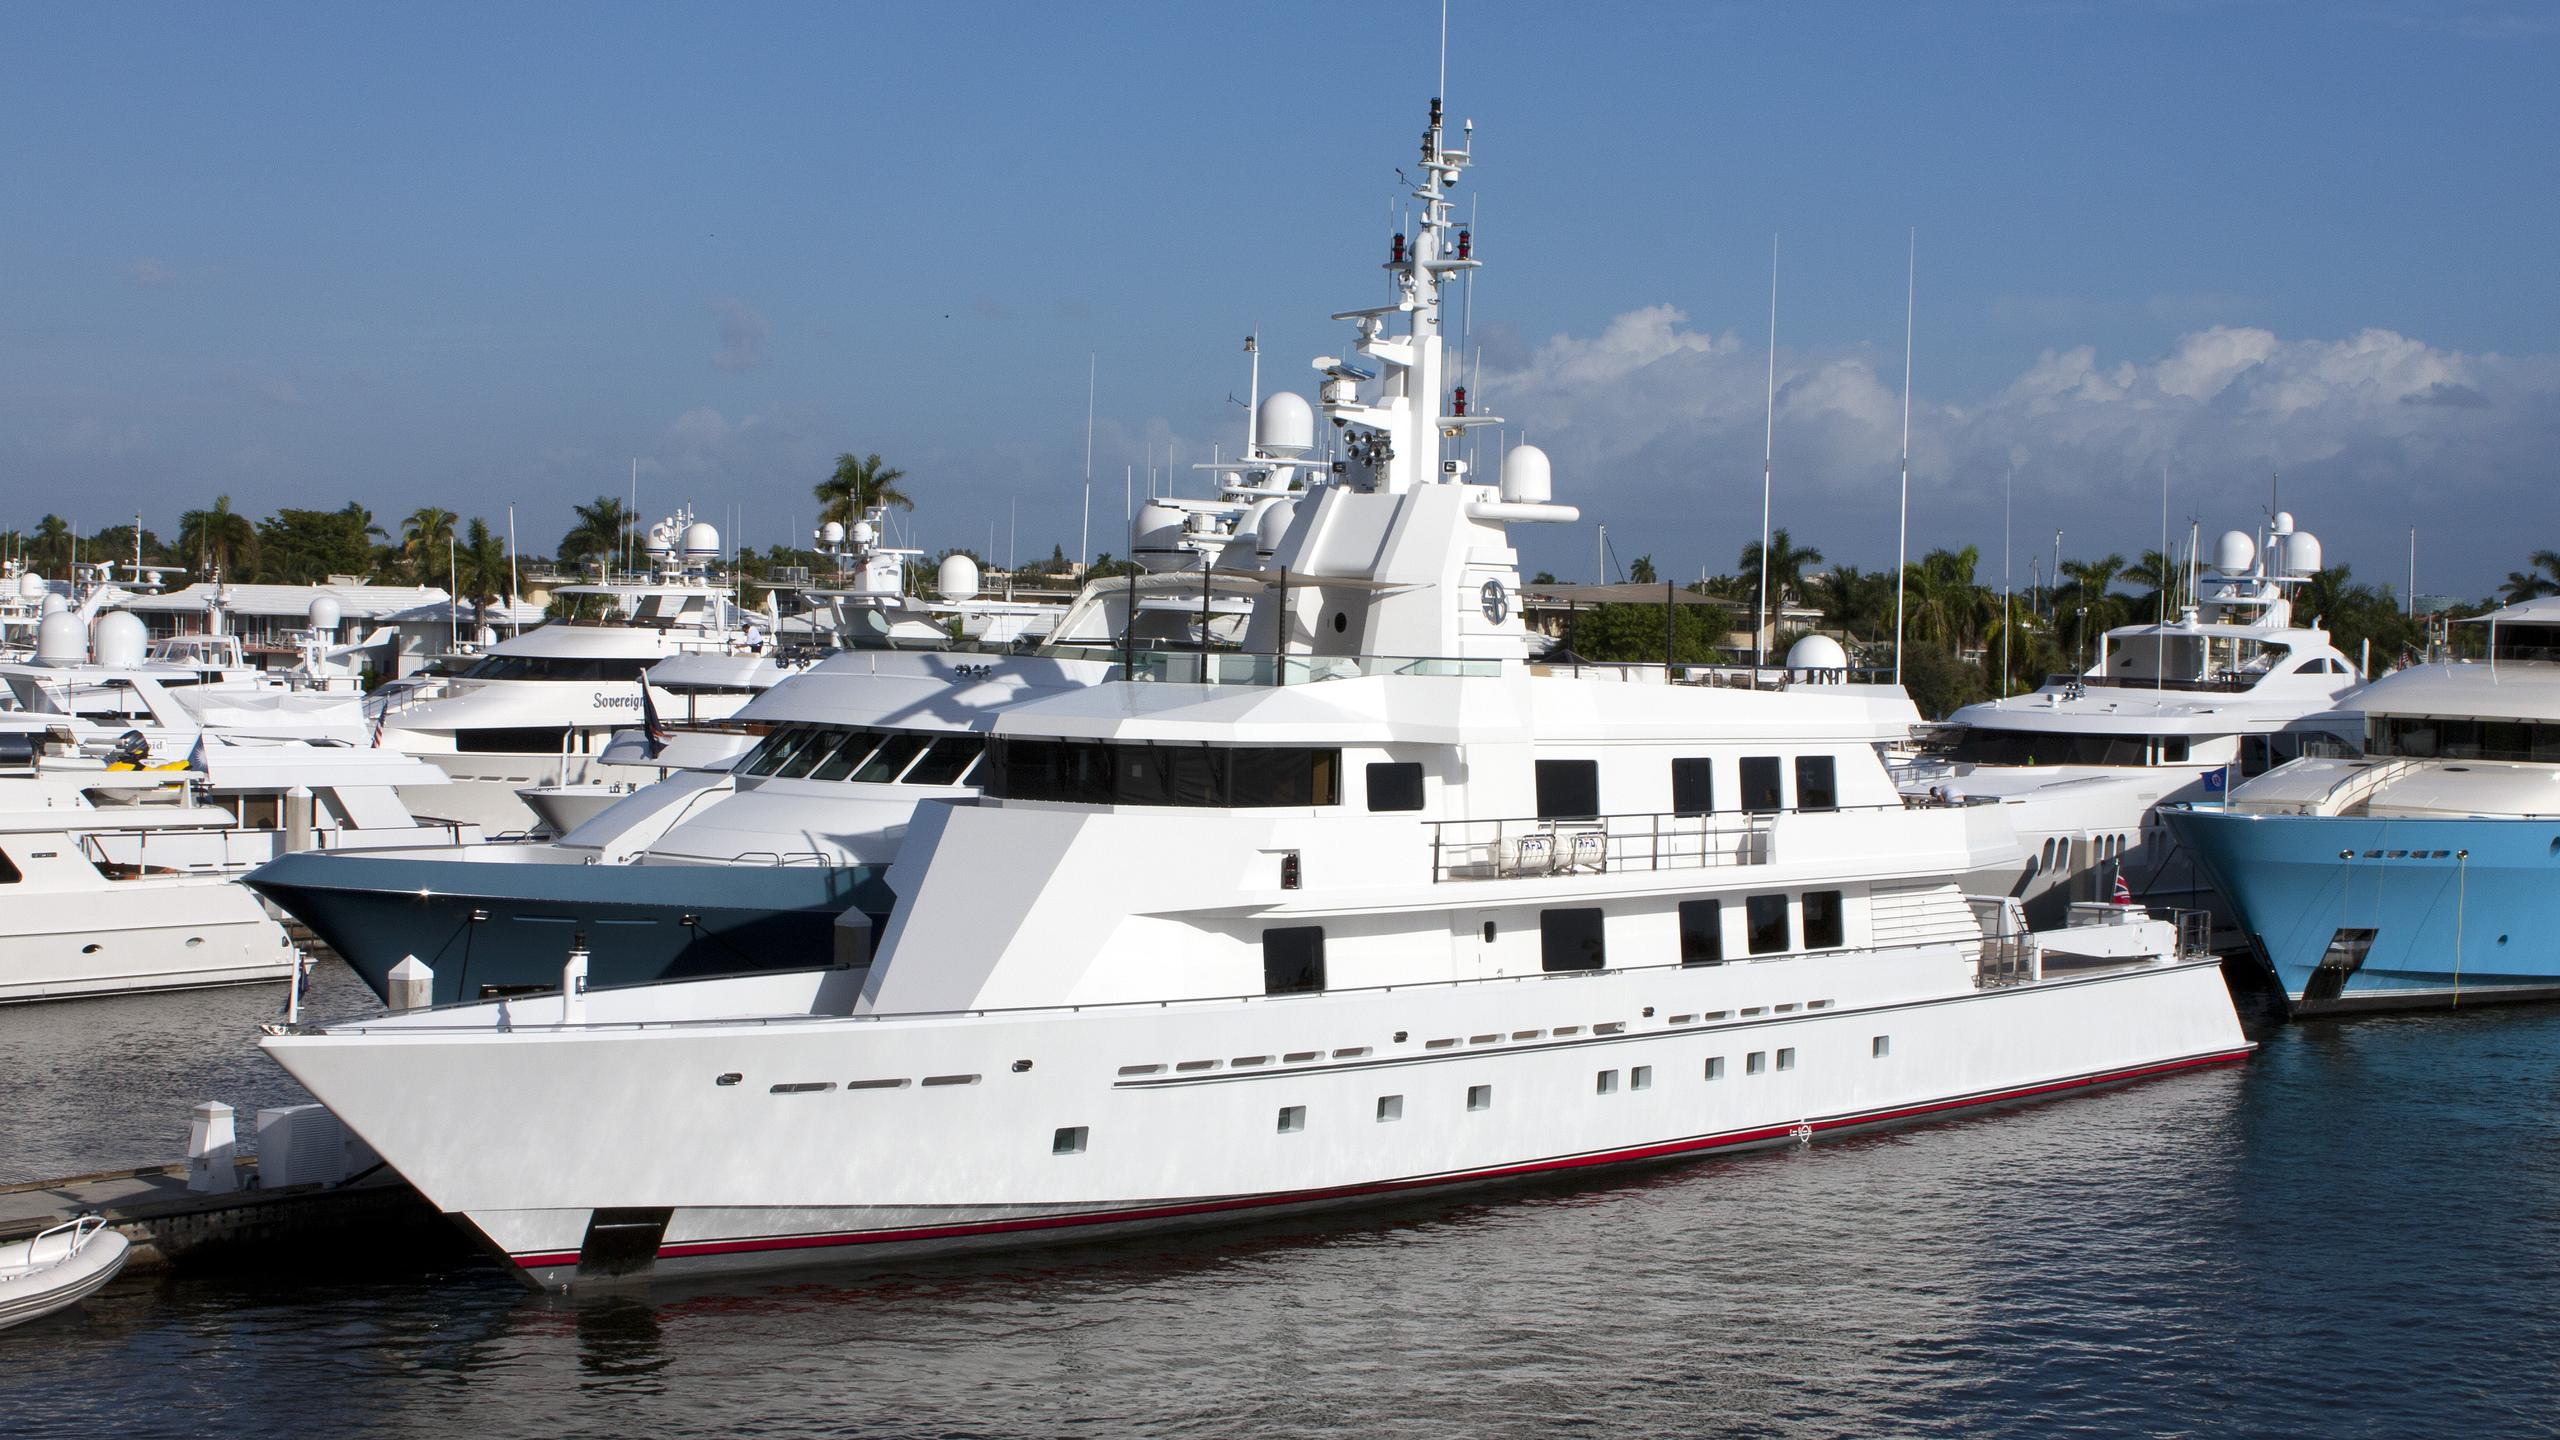 mizu-sea-bowld-motor-yacht-oceanfast-2004-53m-half-profile